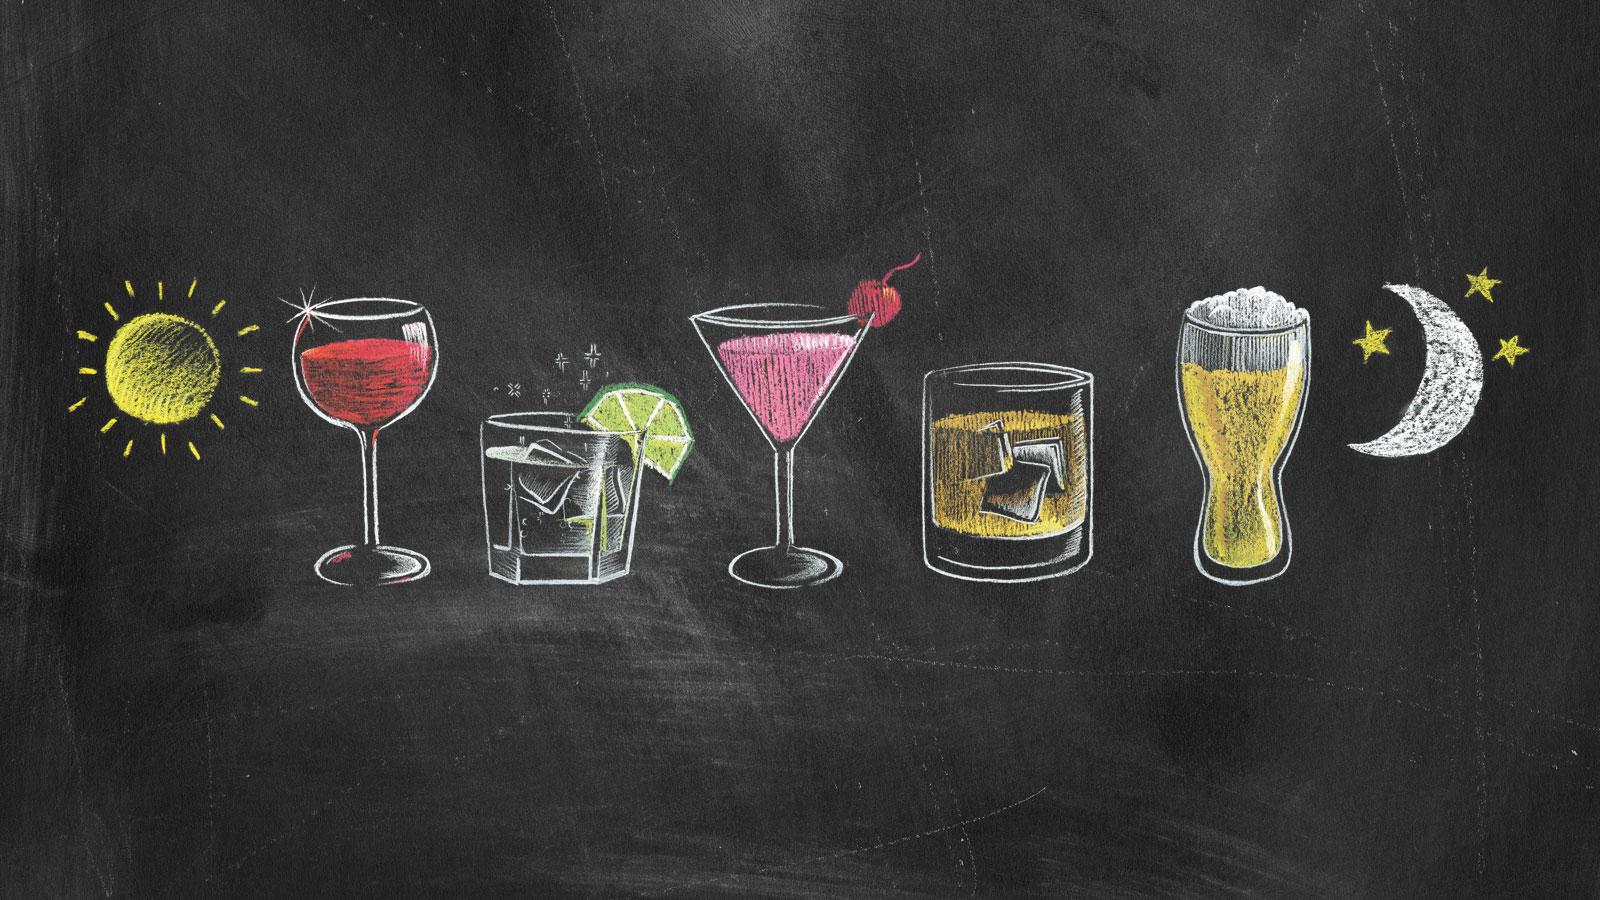 Drawings of Beverages